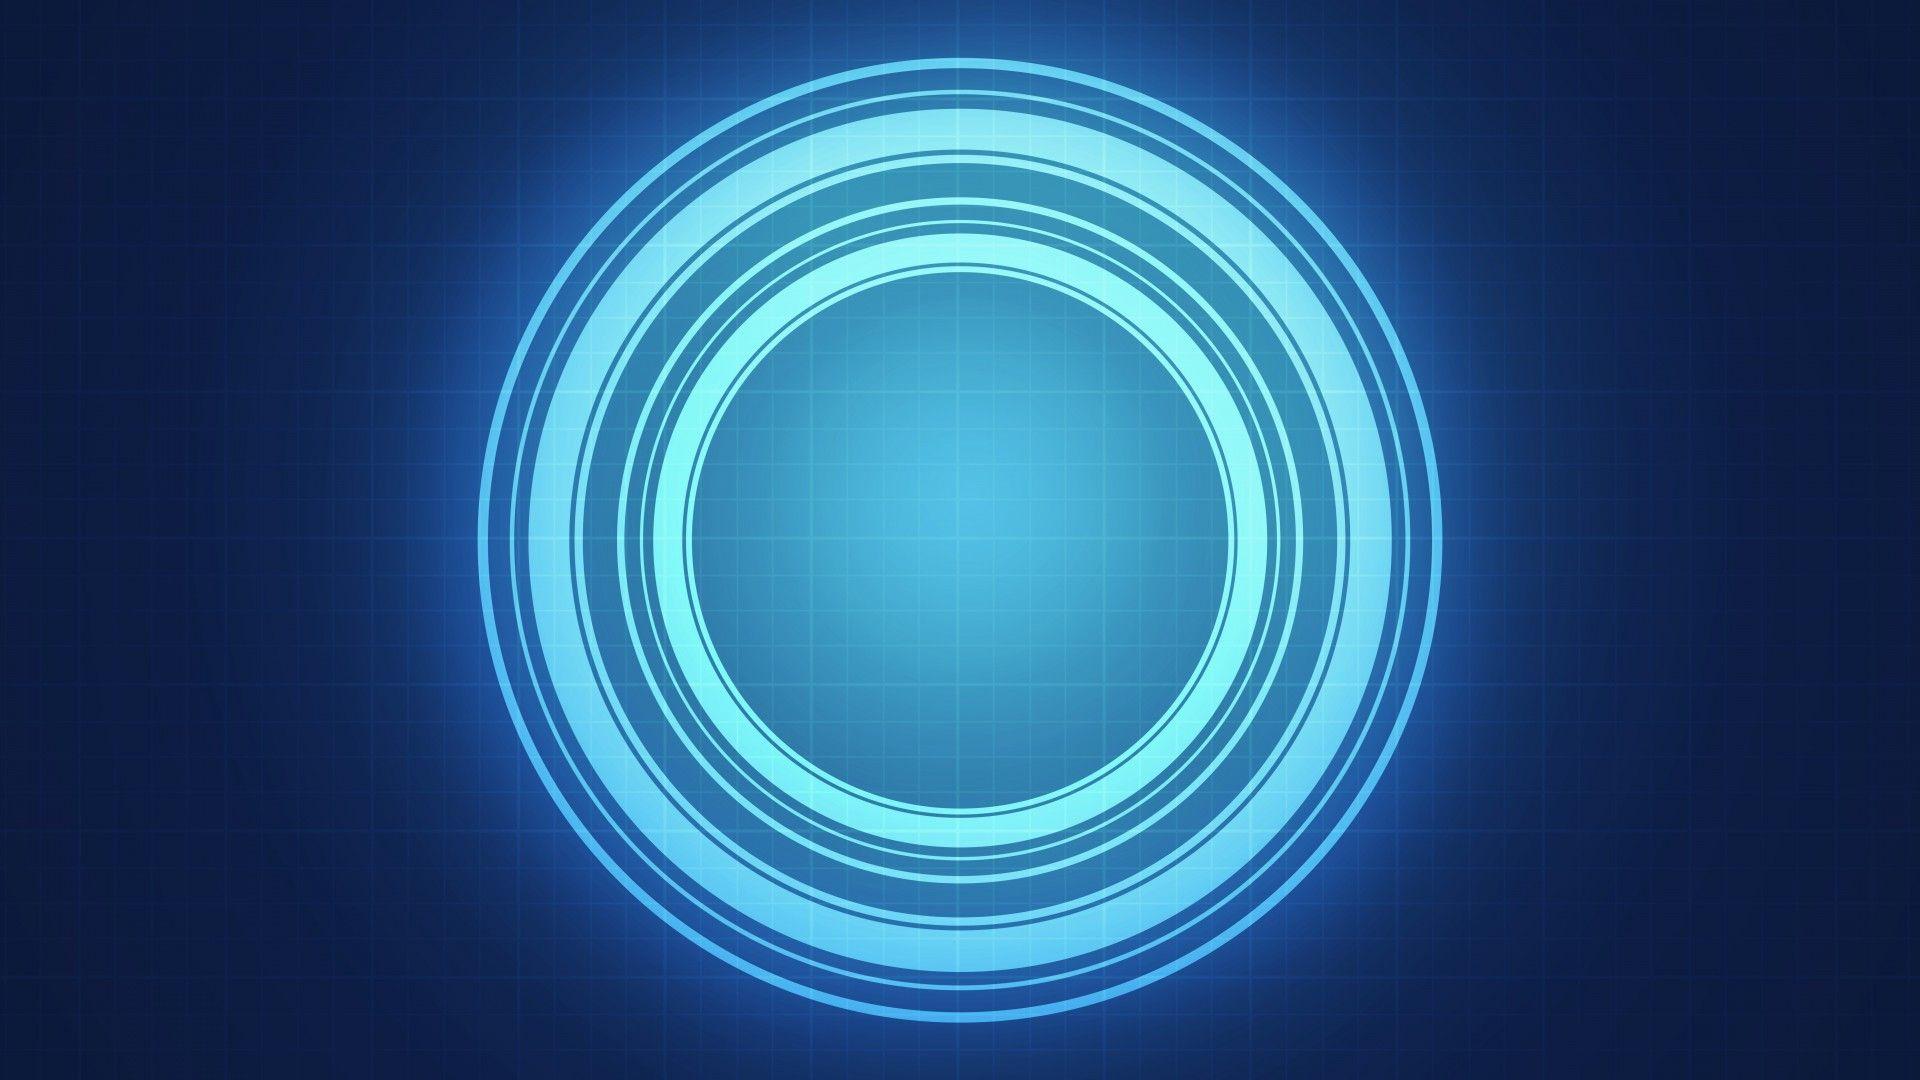 Circle 1920x1080 wallpaper